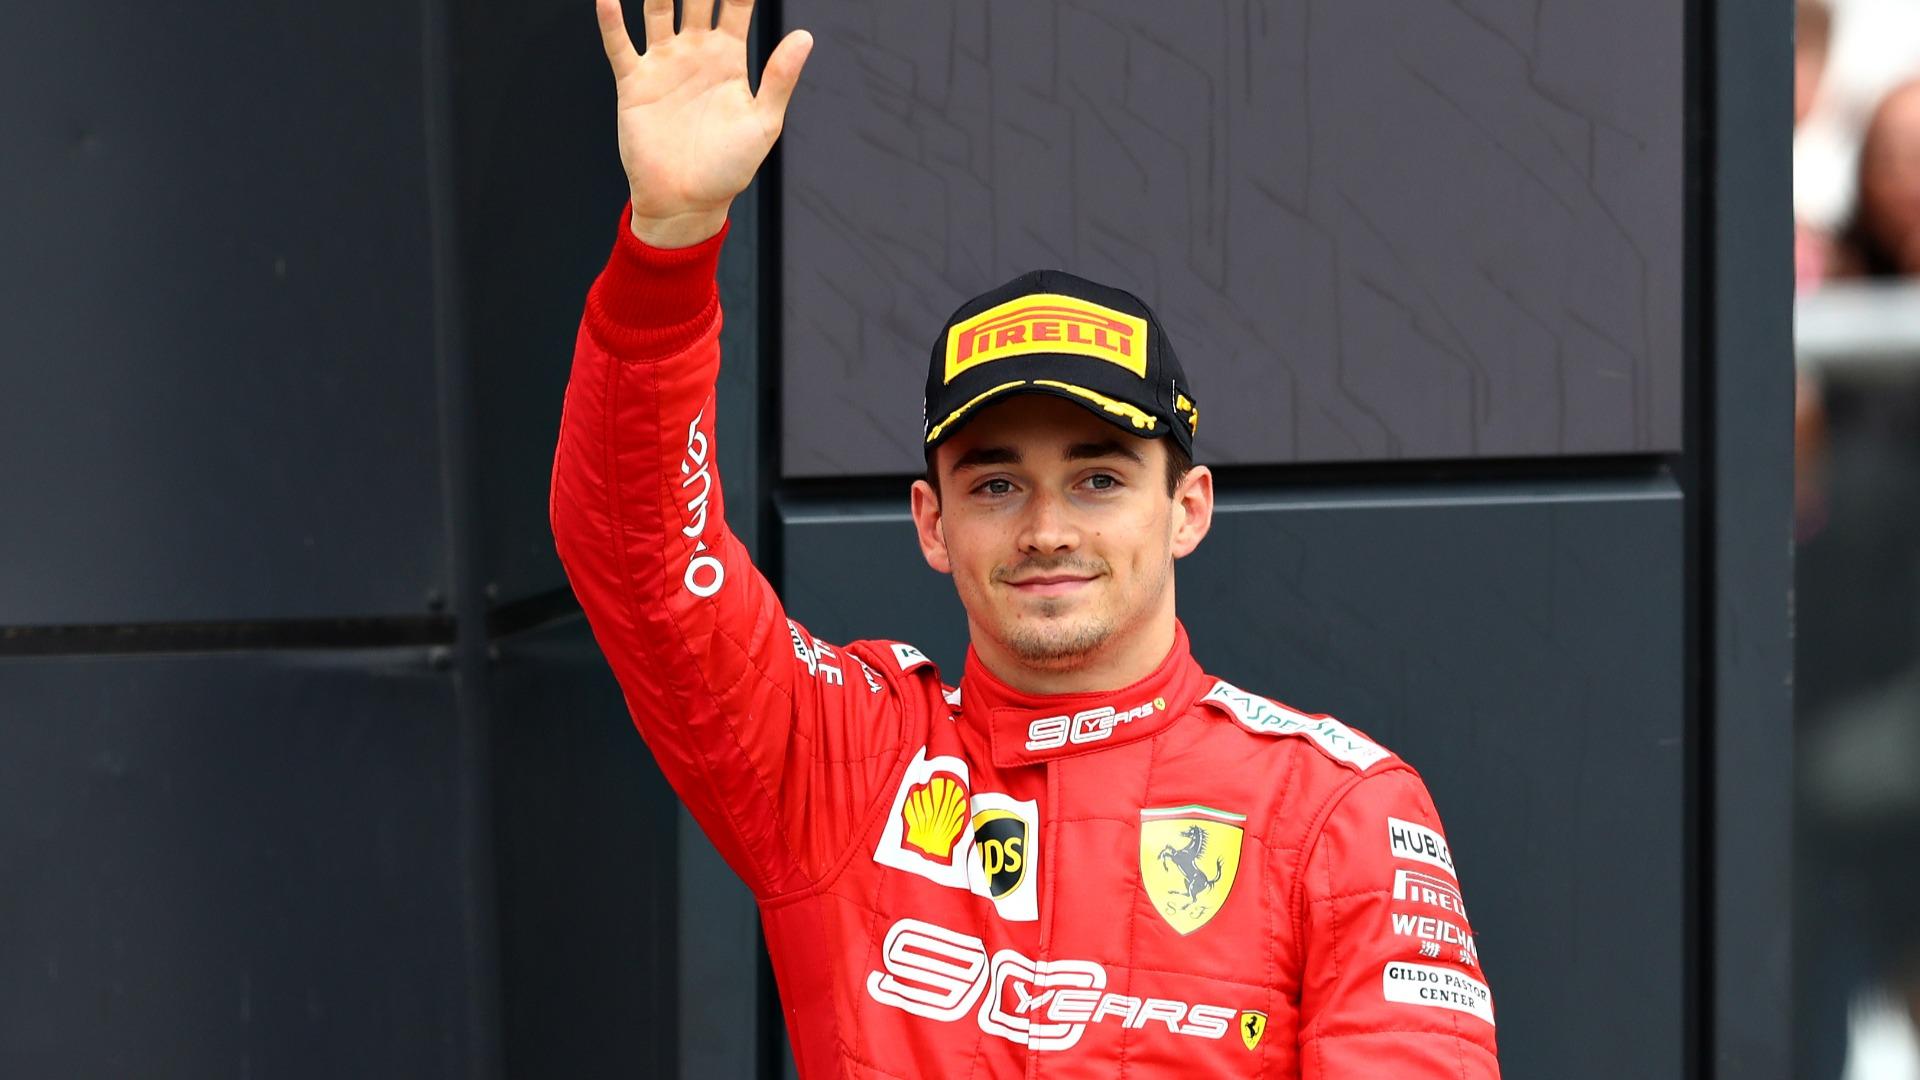 F1 Raceweek: Leclerc emerging from Vettel's shadow in tumultuous Ferrari season